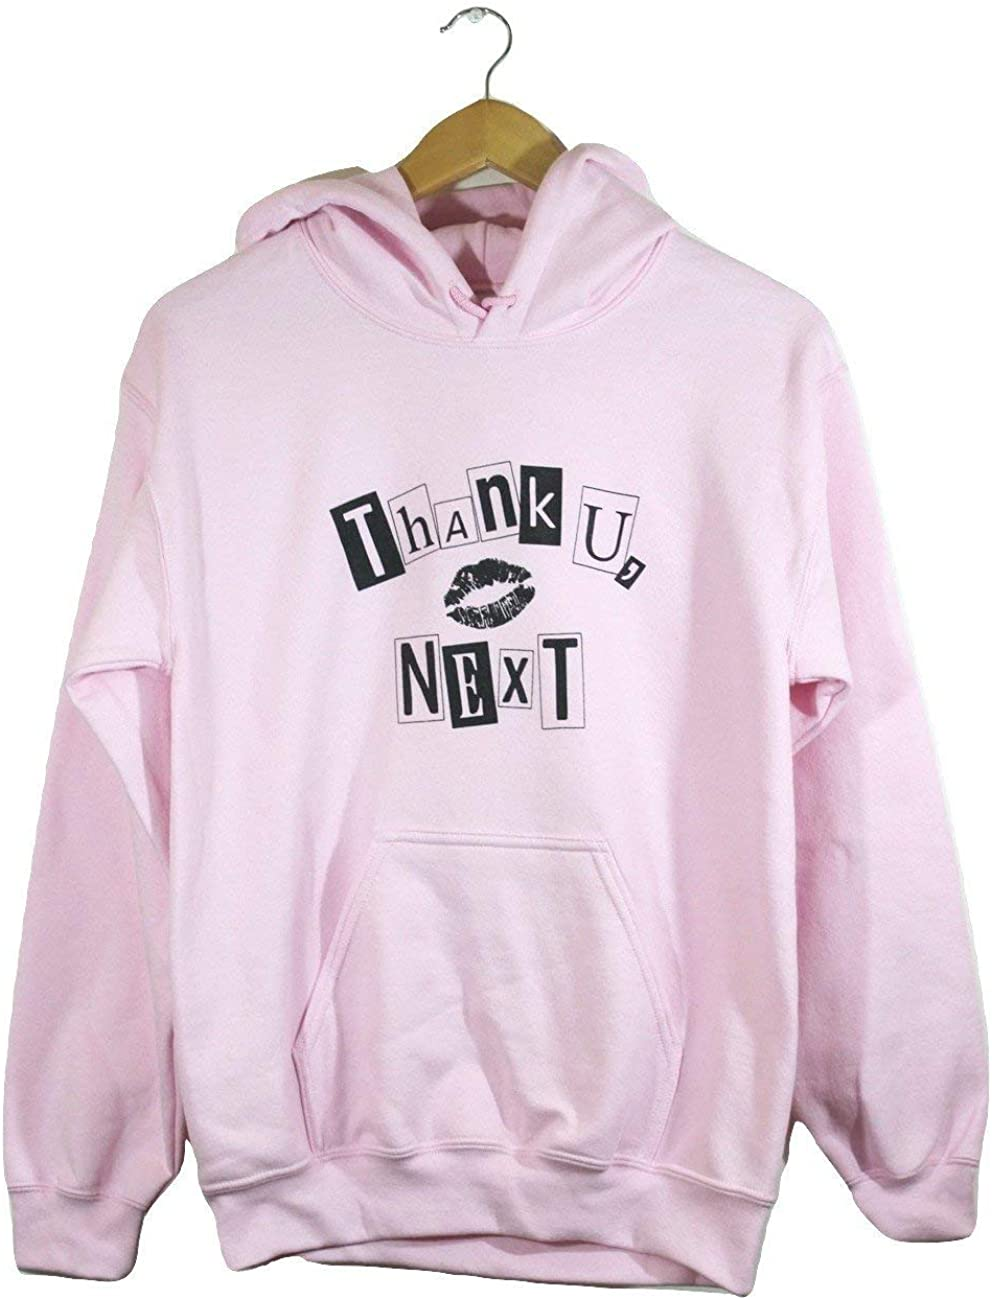 Mens /& Womens SUPER SOFT Deluxe Hooded Sweatshirt Hoodie Jumper Sweat Cotton lot